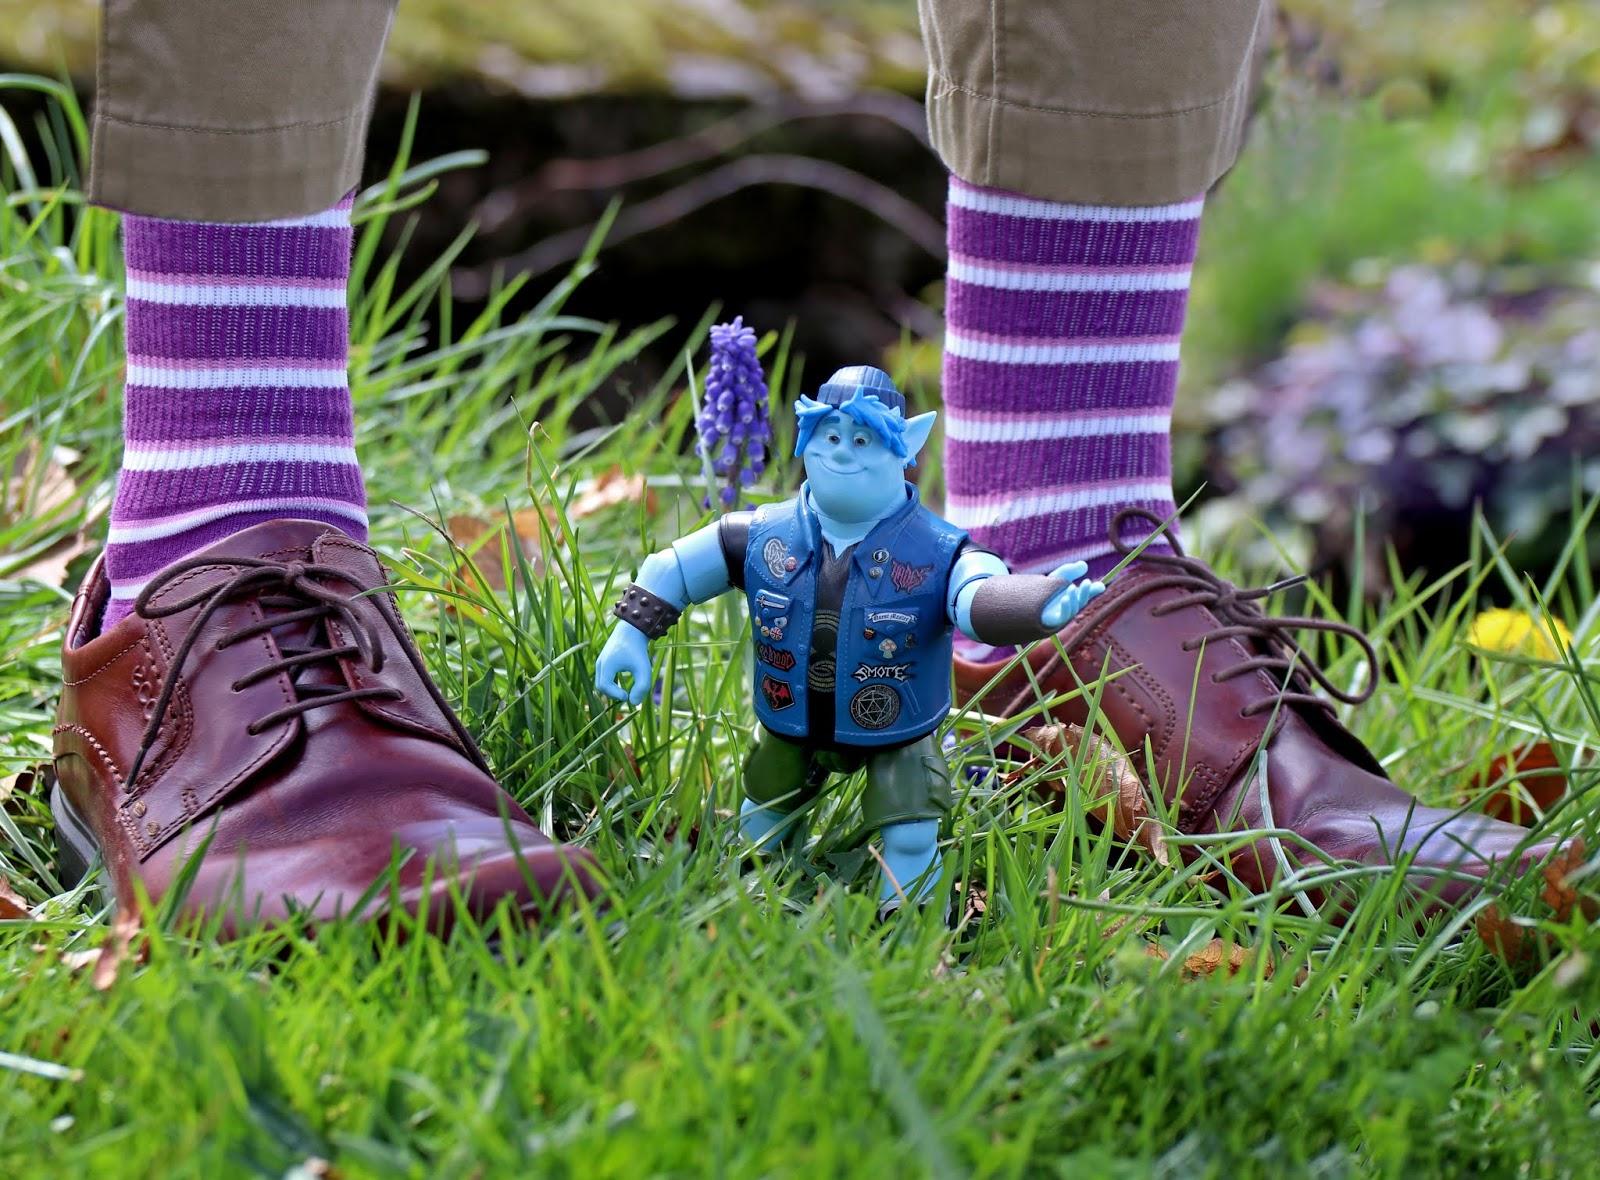 onward wilden lightfoot dad socks boxlunch